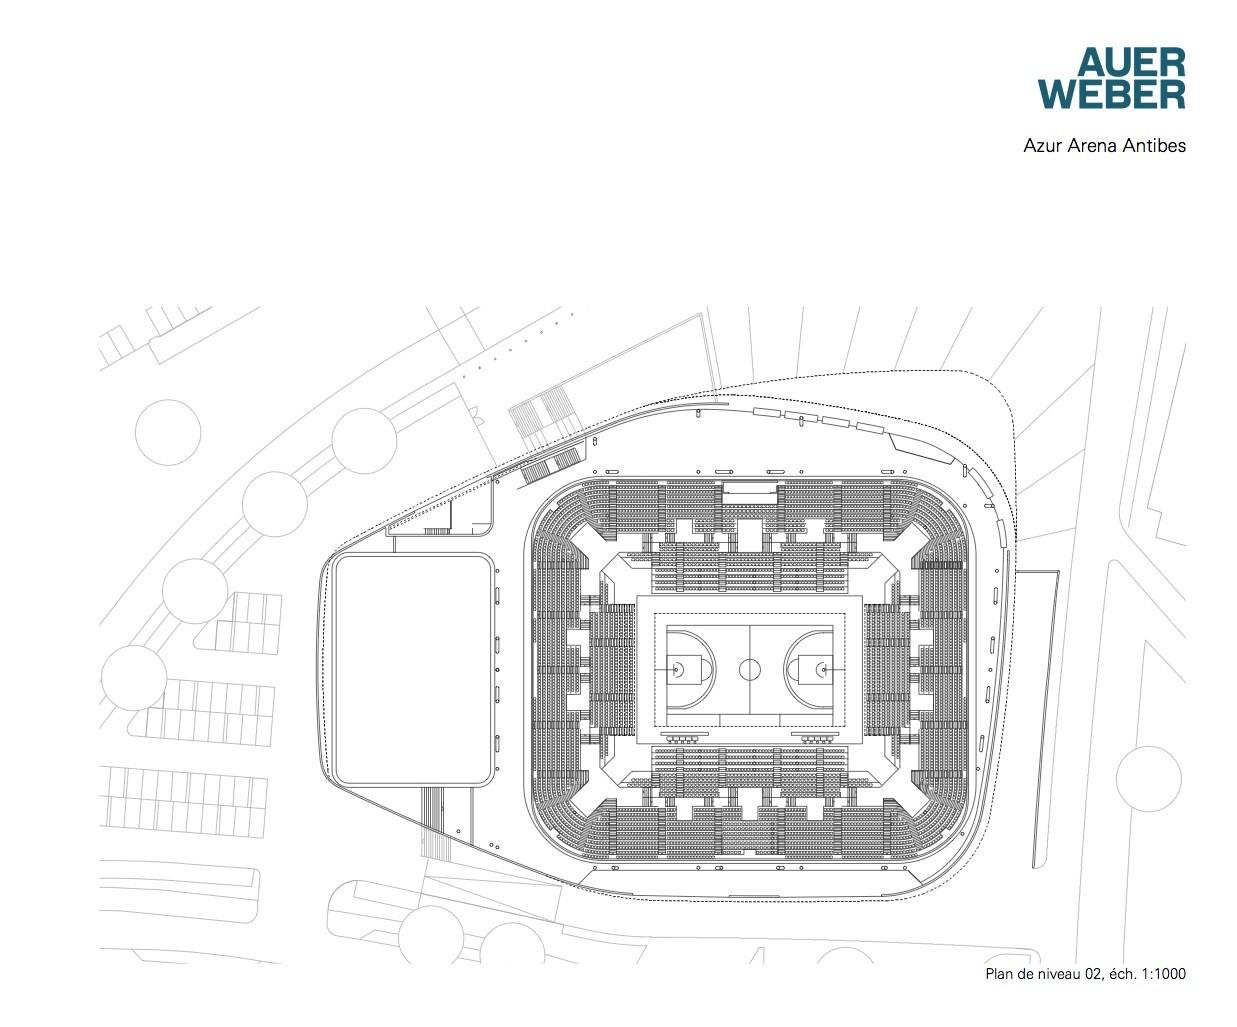 gallery of azur arena auer weber 10 azur arena auer weber